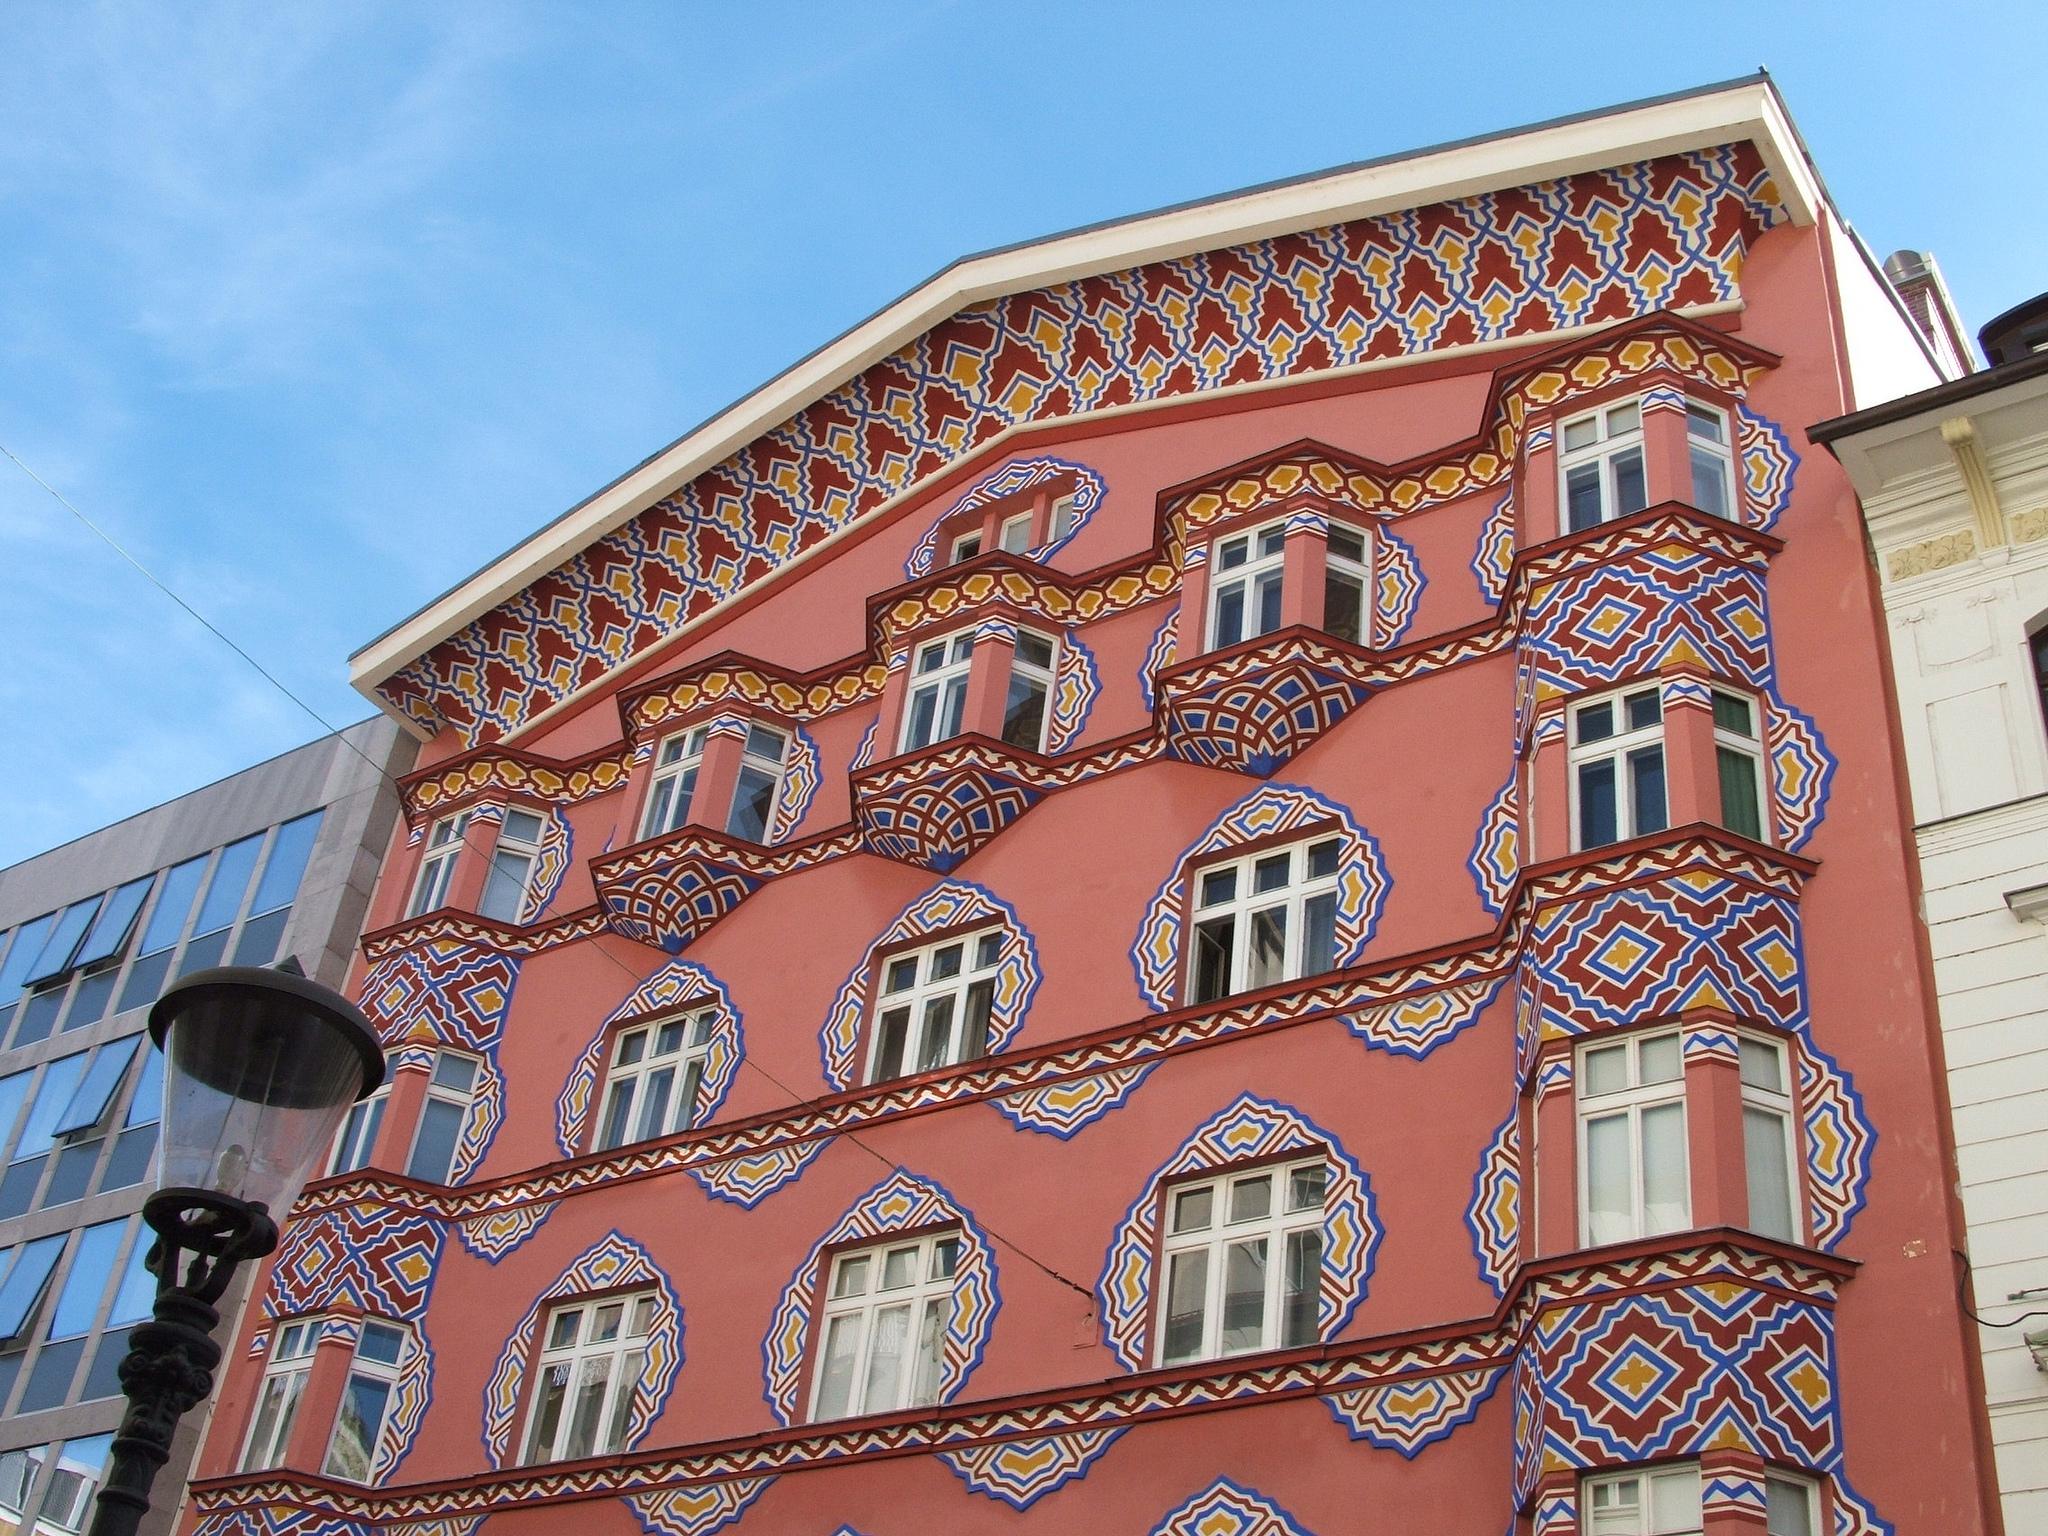 Ljubljana maison vurnik